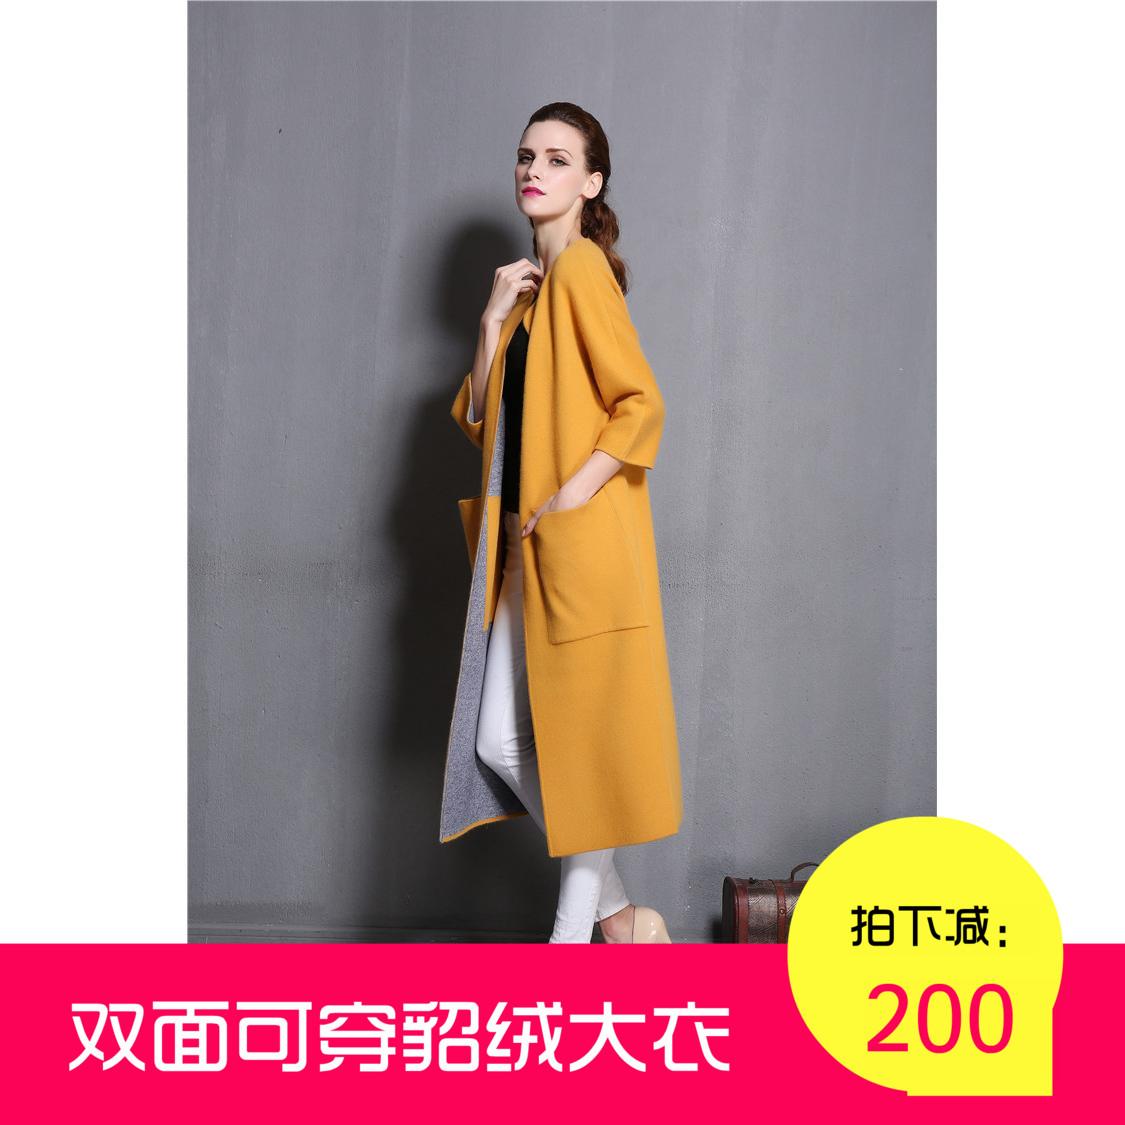 黄色貂绒大衣